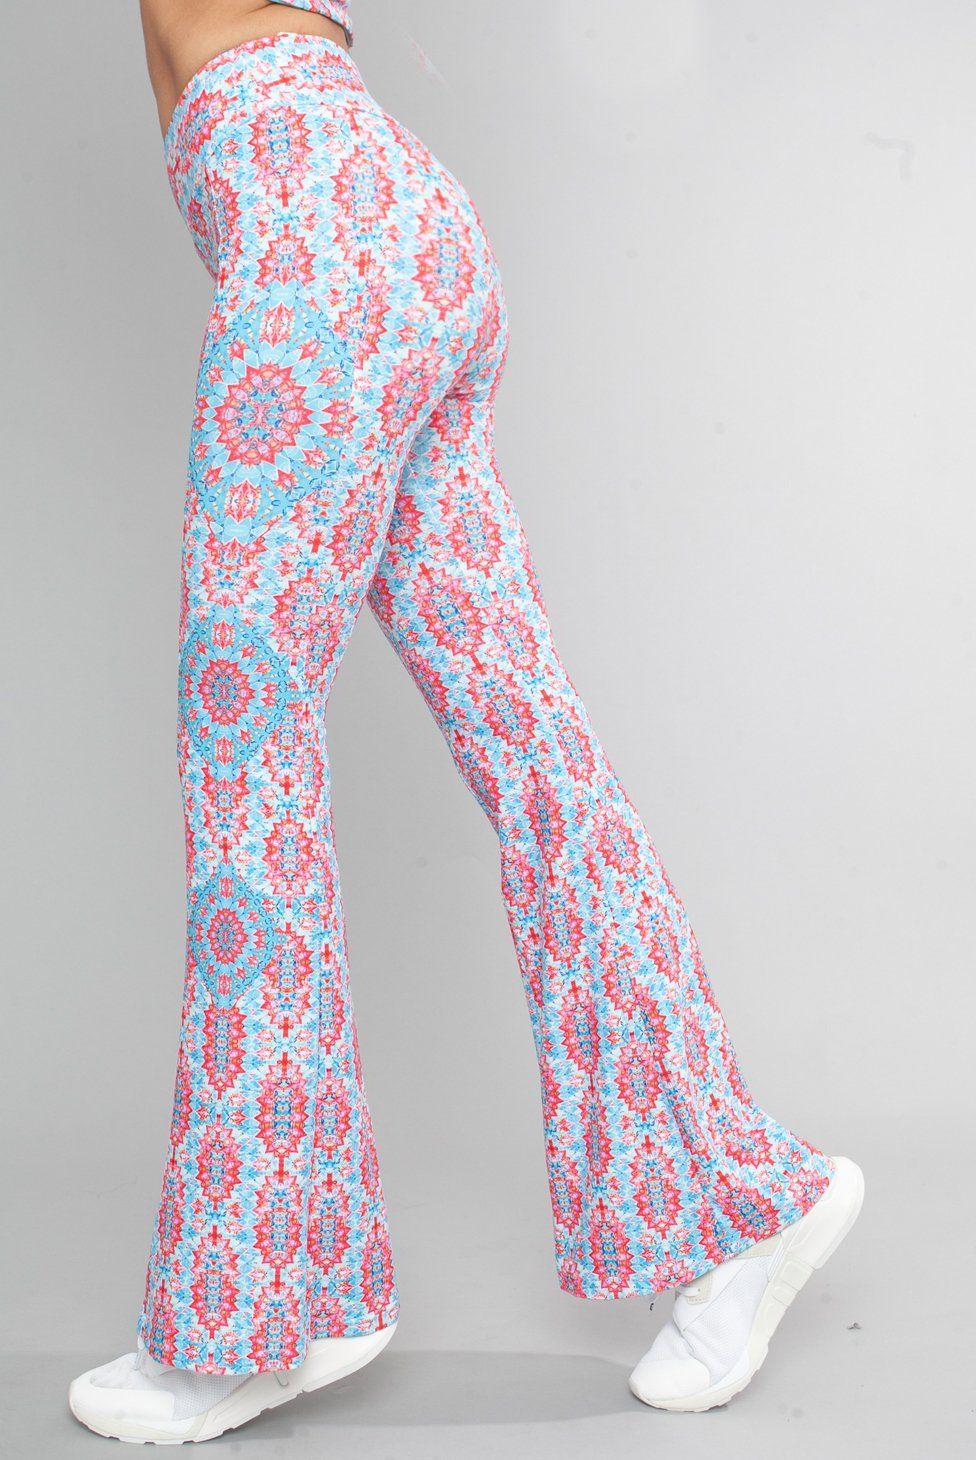 35++ Yoga pants flare bottom trends